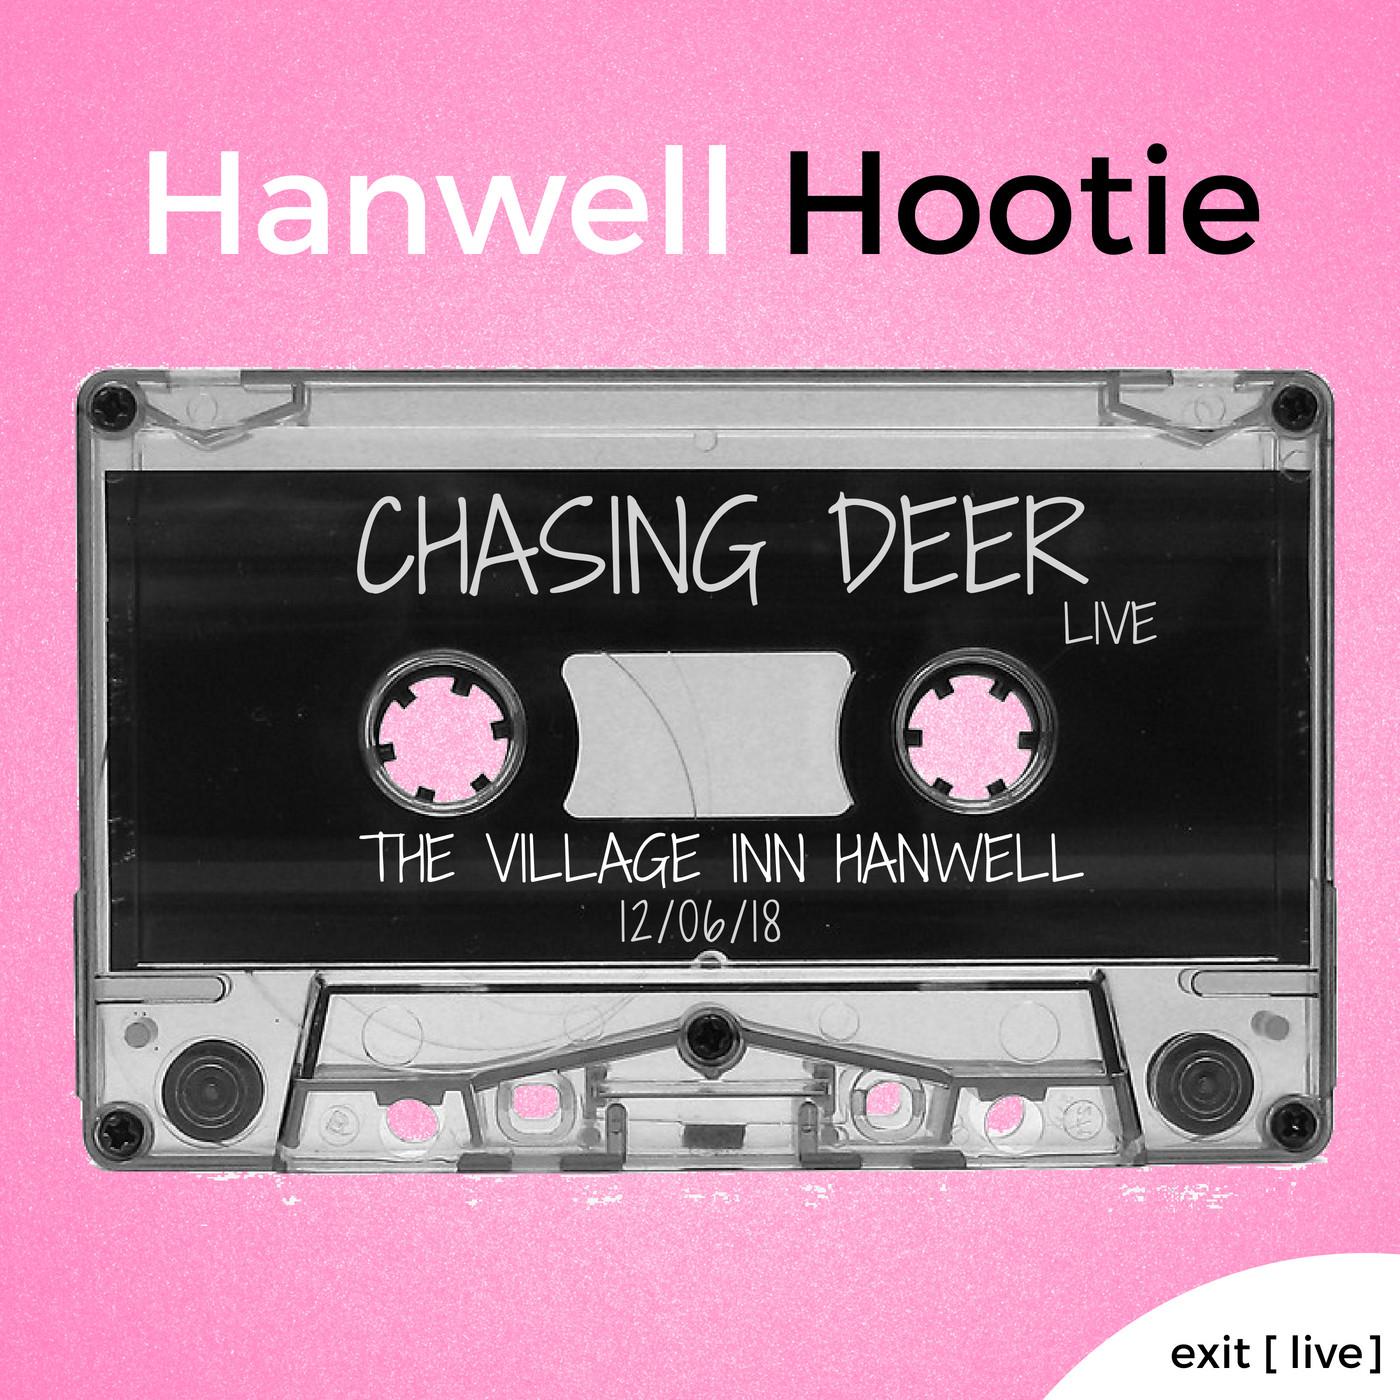 Hanwell Hootie 2018